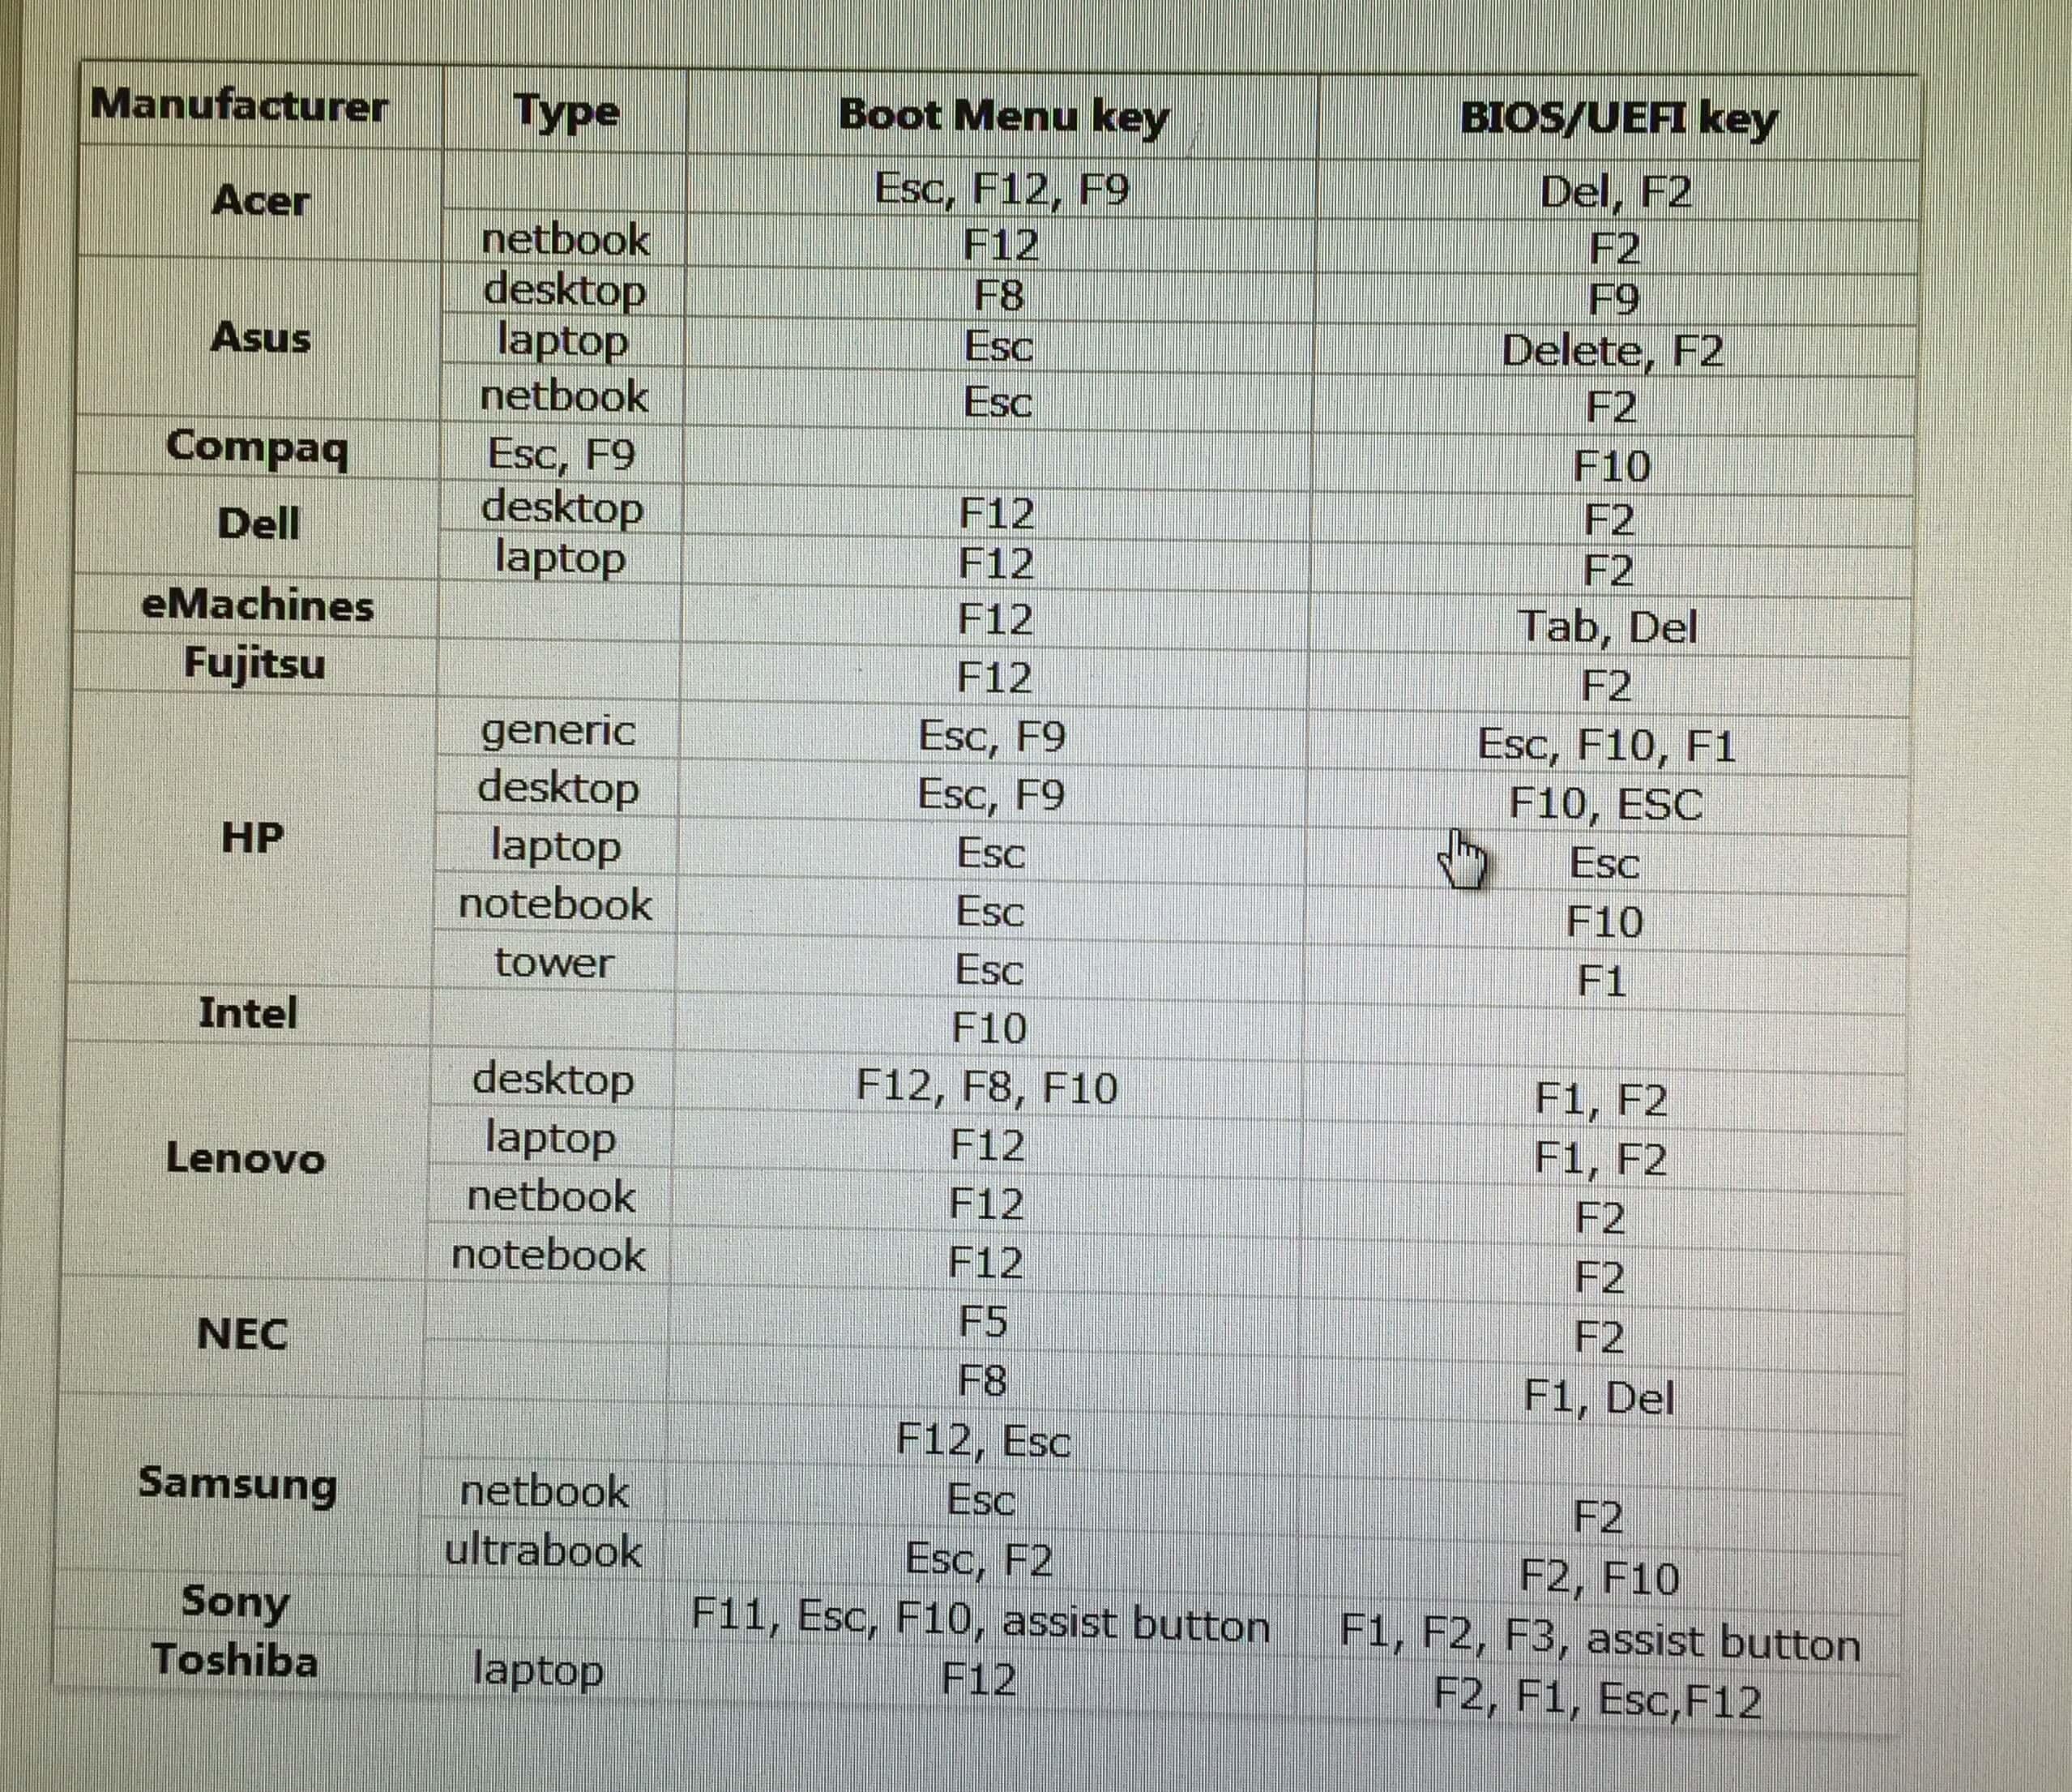 Keyboard Shortcuts for Bios or Boot menu 1